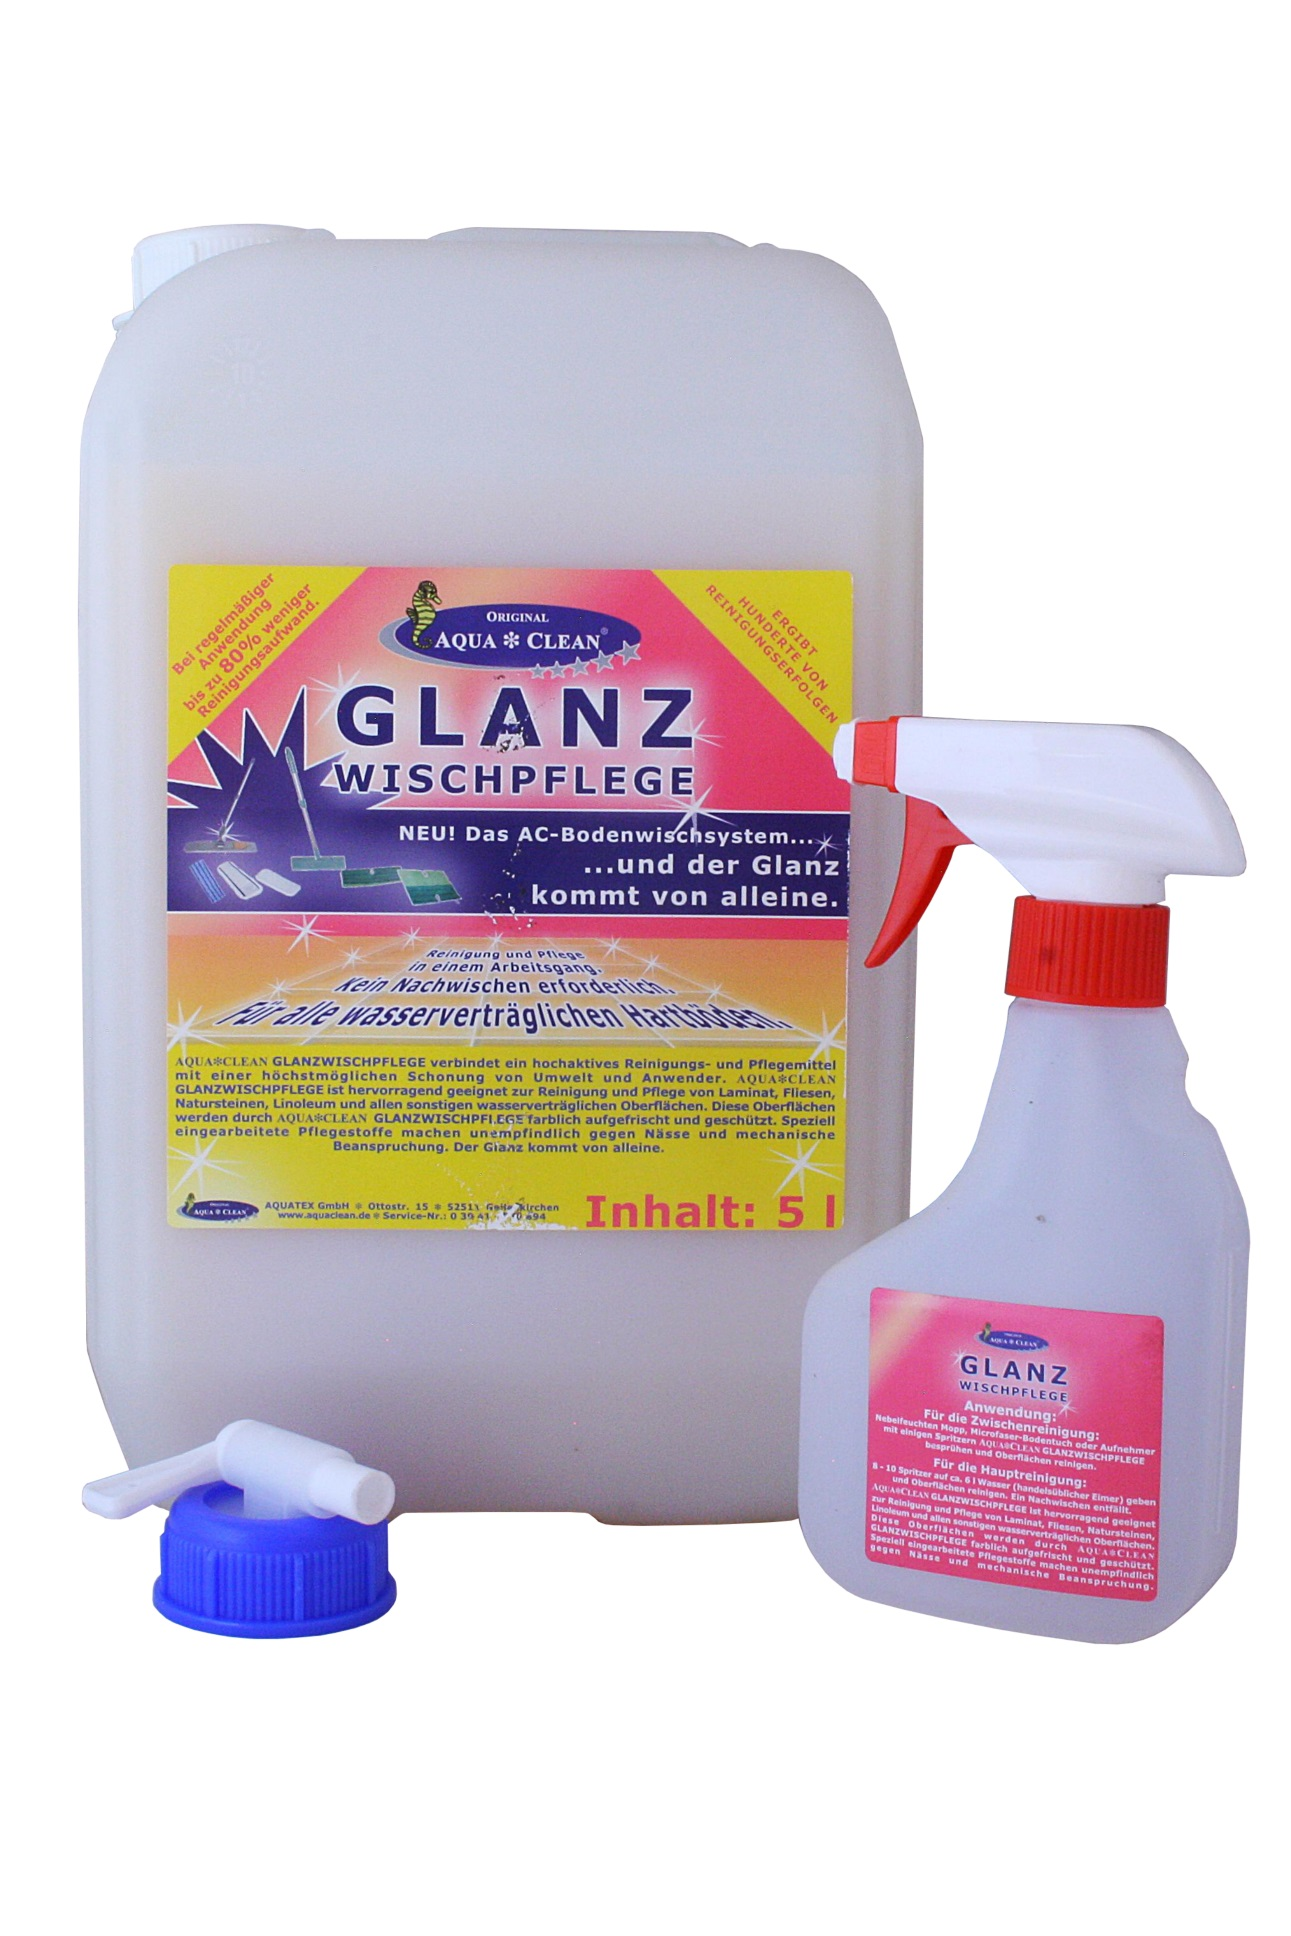 aqua clean glanzwischpflege 5l aqua clean direkt vom. Black Bedroom Furniture Sets. Home Design Ideas